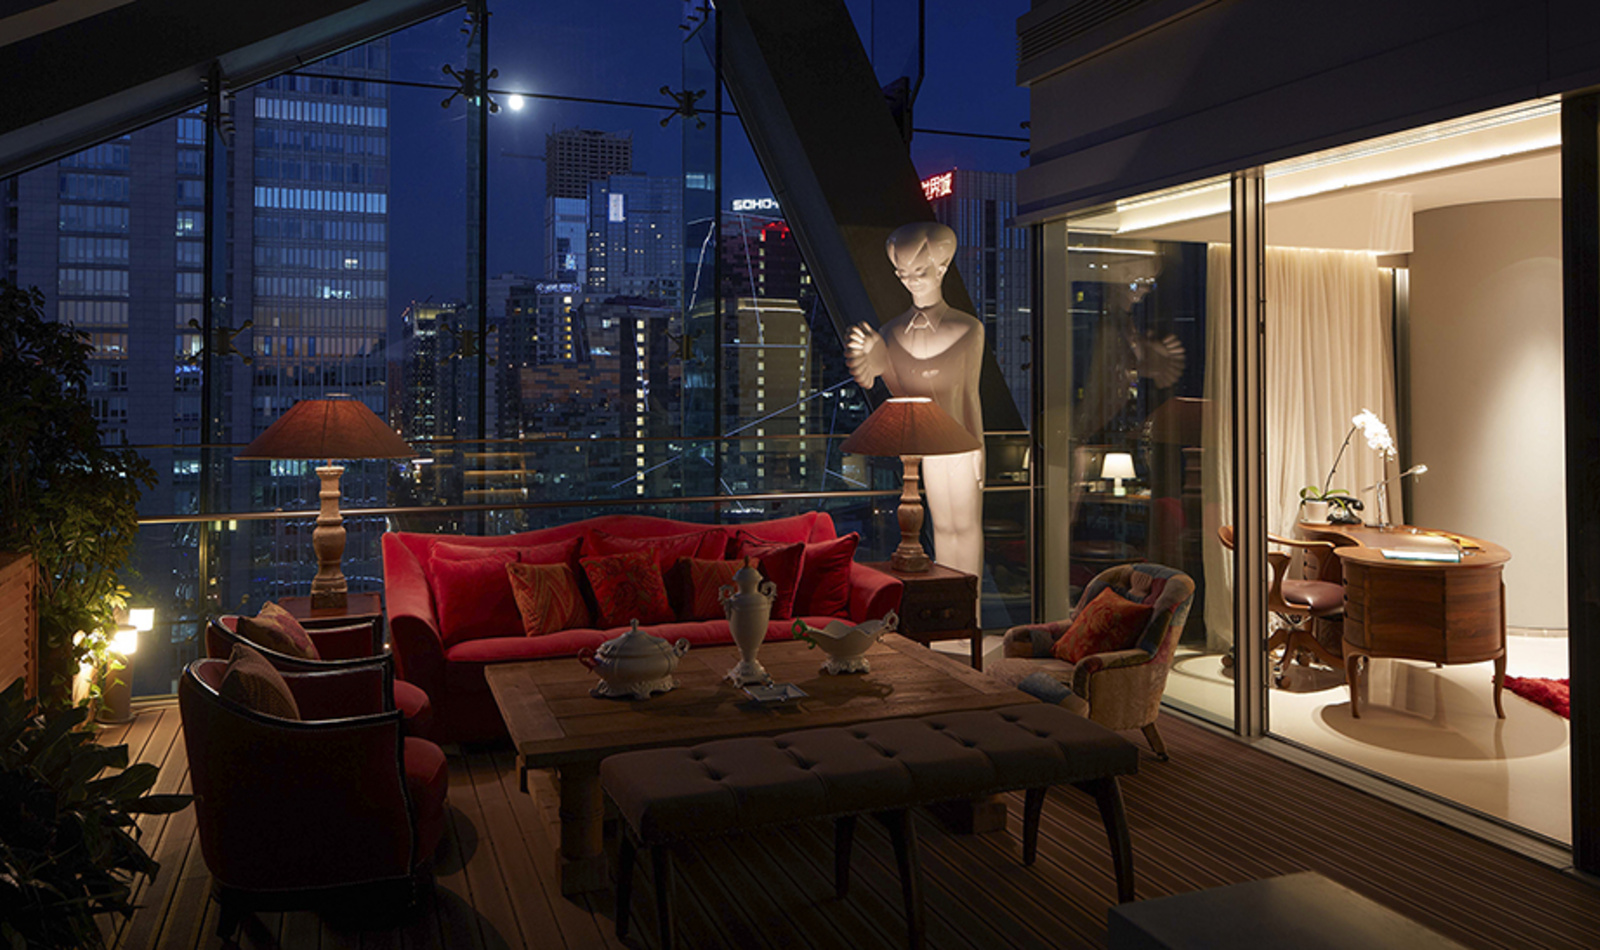 L'hôtel Eclat, Beijing, Chine - Photo: eclathotels.com